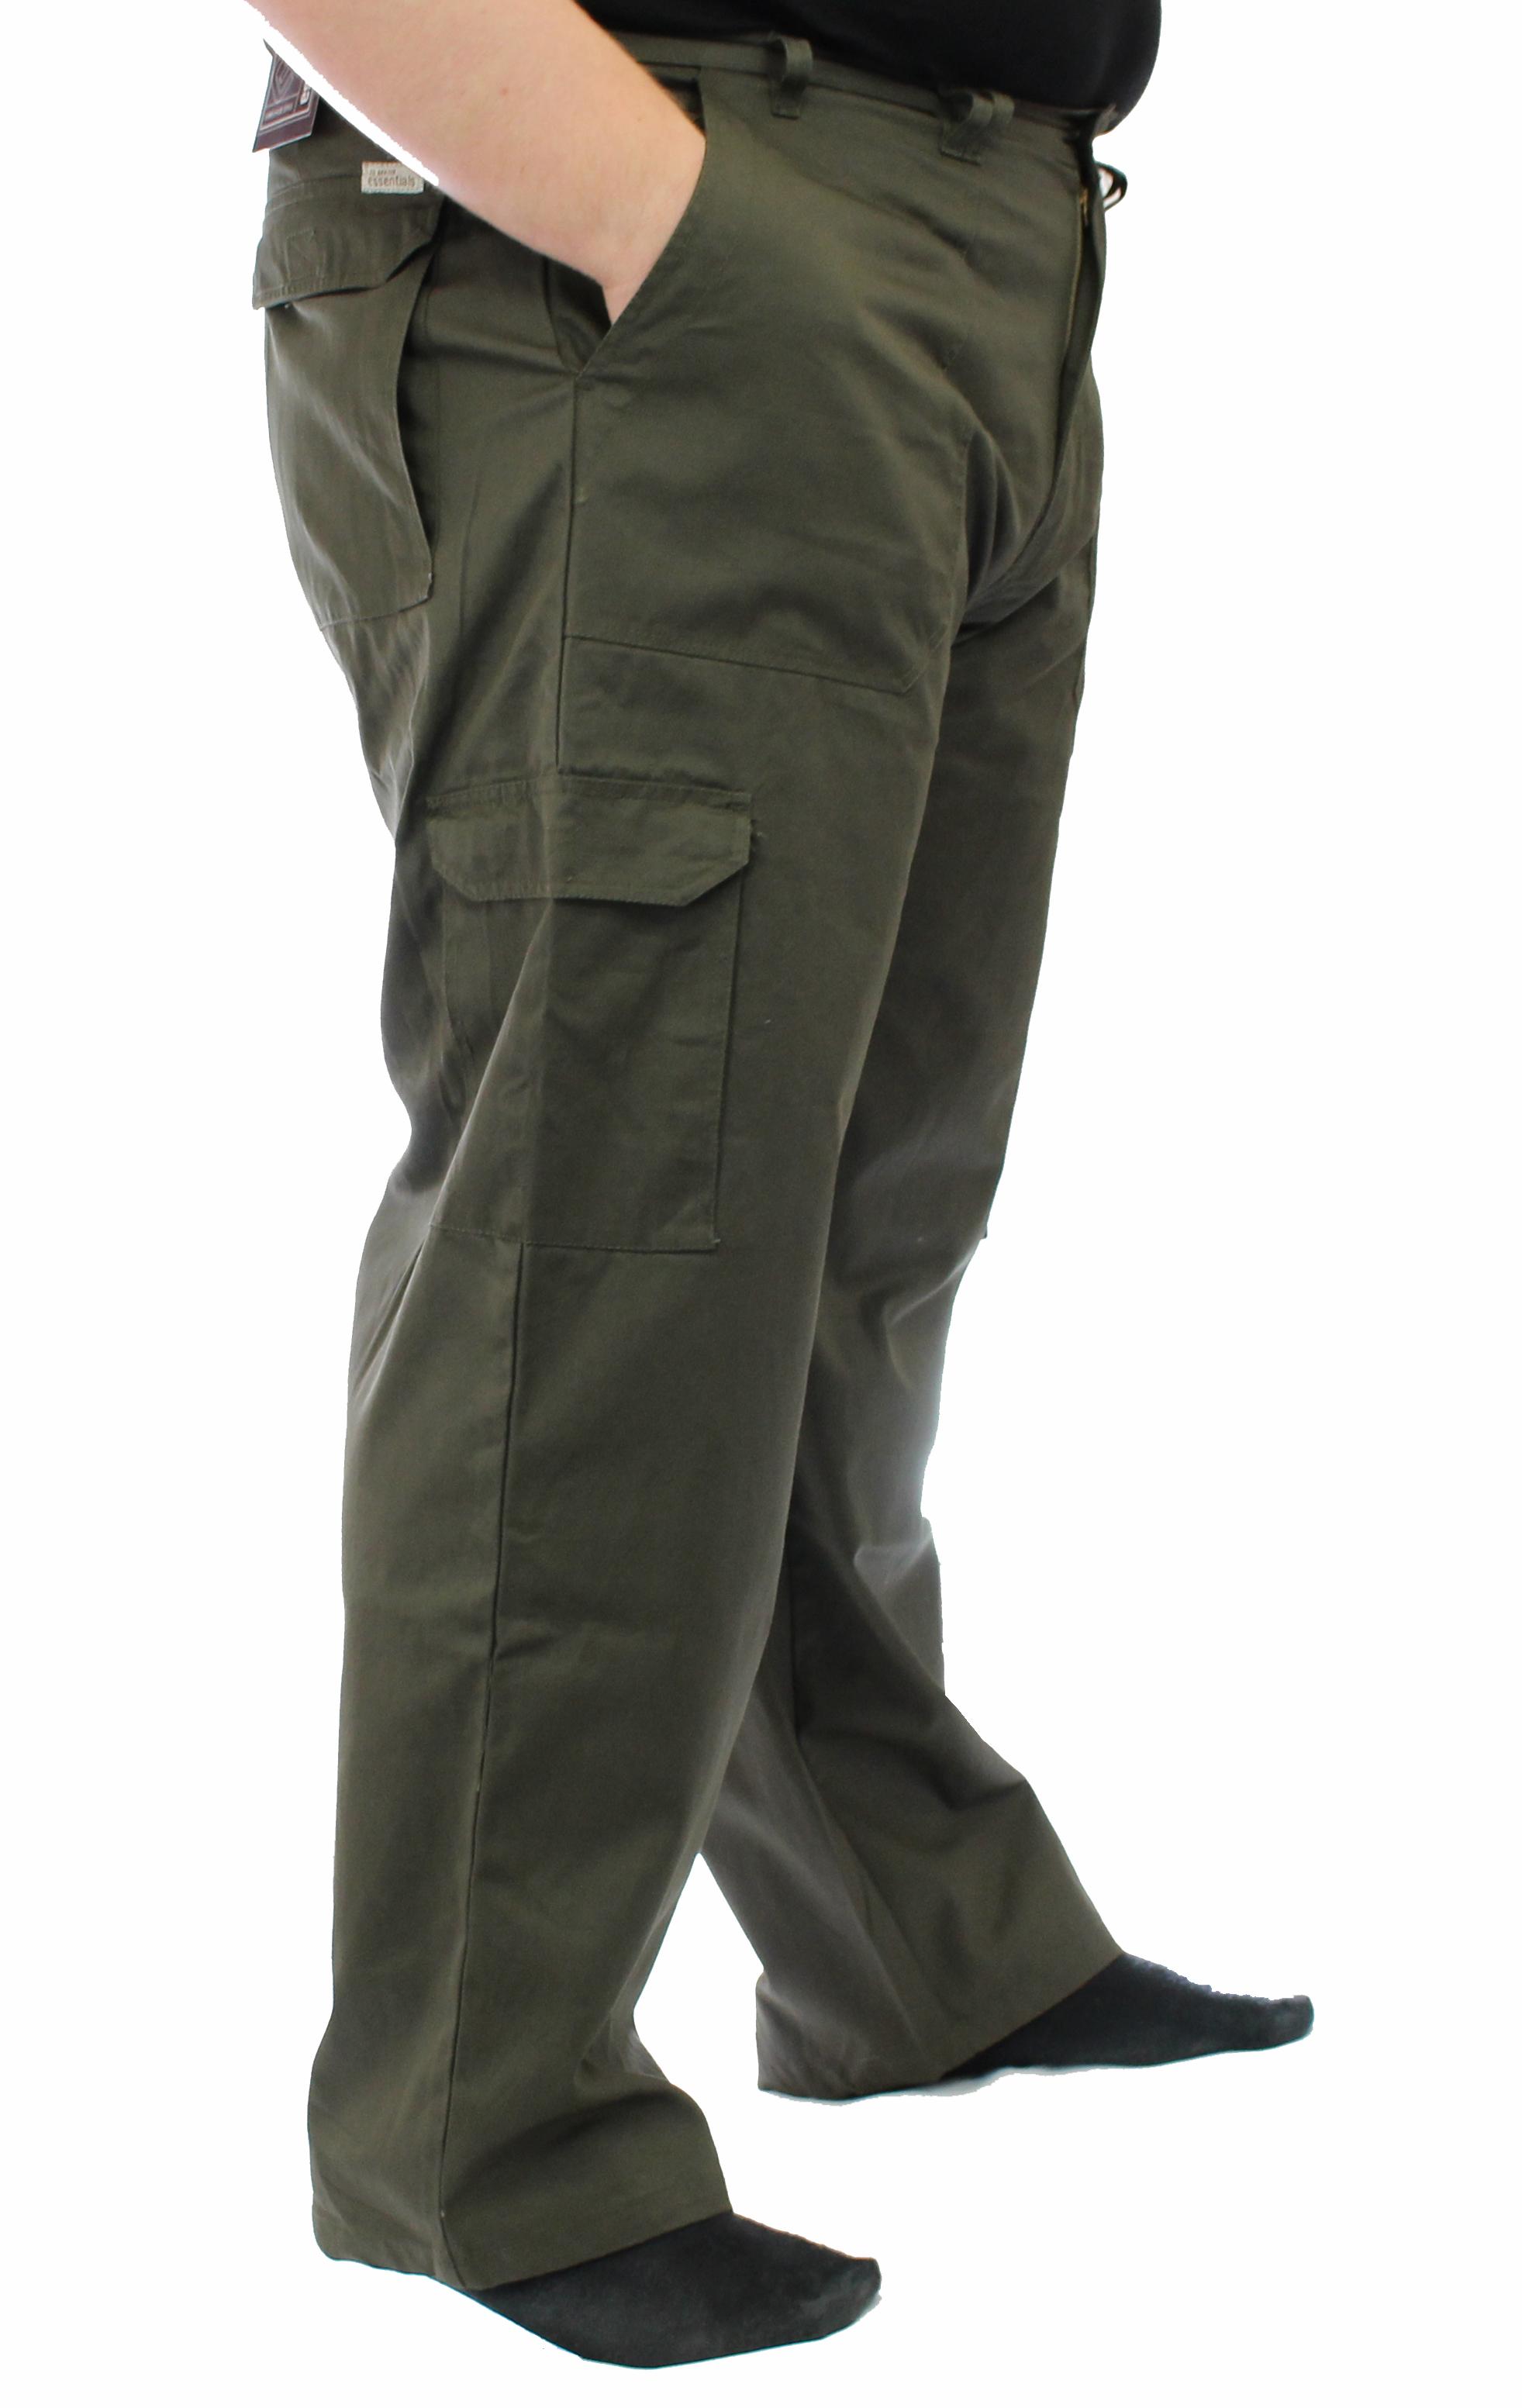 "Ed Baxter Victory - Heavy Duty Cargo Combat Trousers - Khaki - 44"" Waist, 30"" Leg"